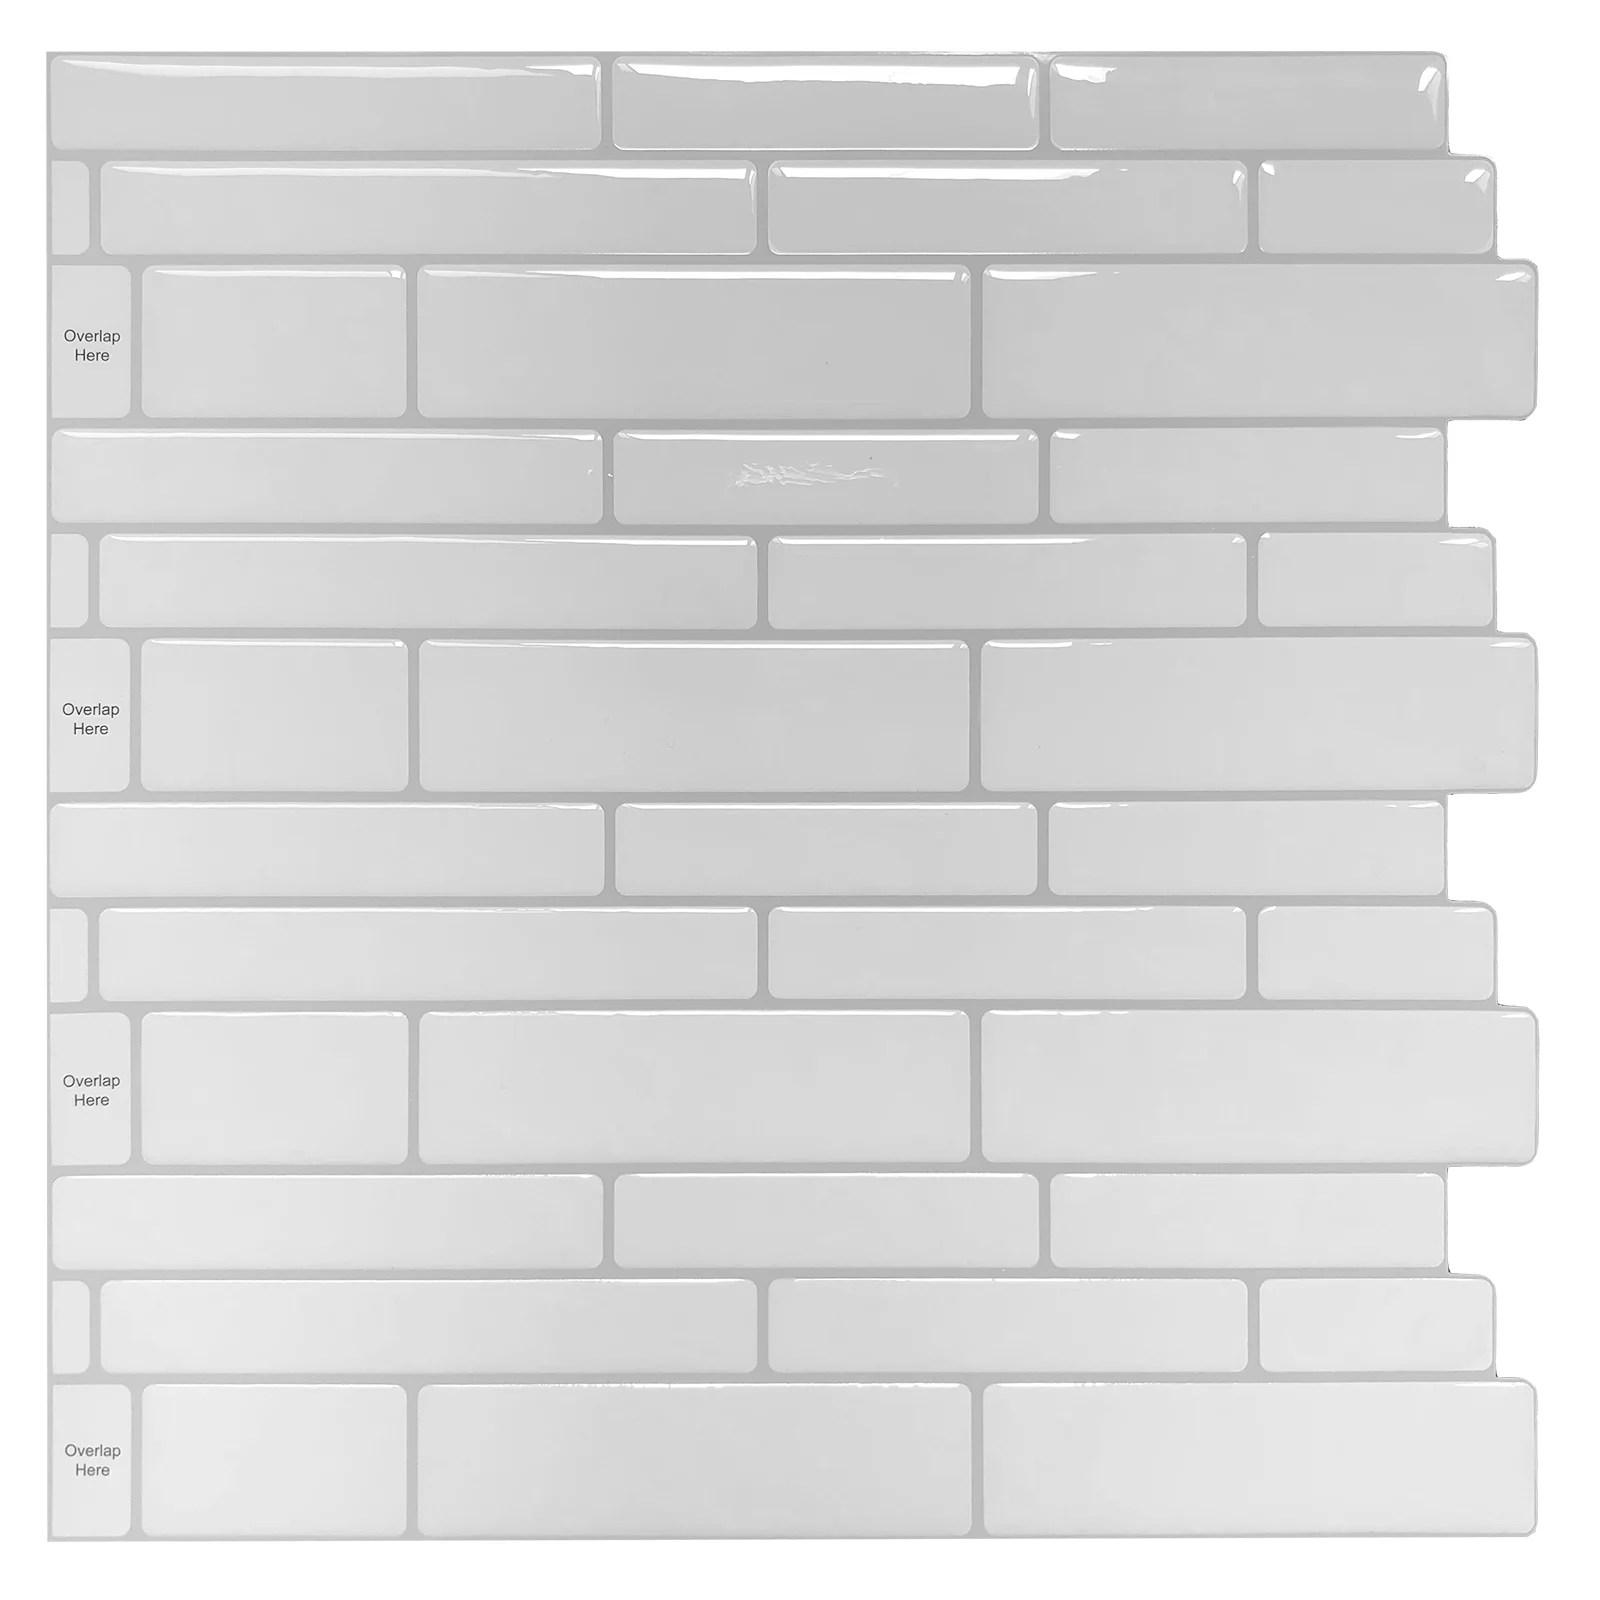 longking peel and stick backsplash tile white subway wall tile 12 in x 12 in 10 pack walmart com